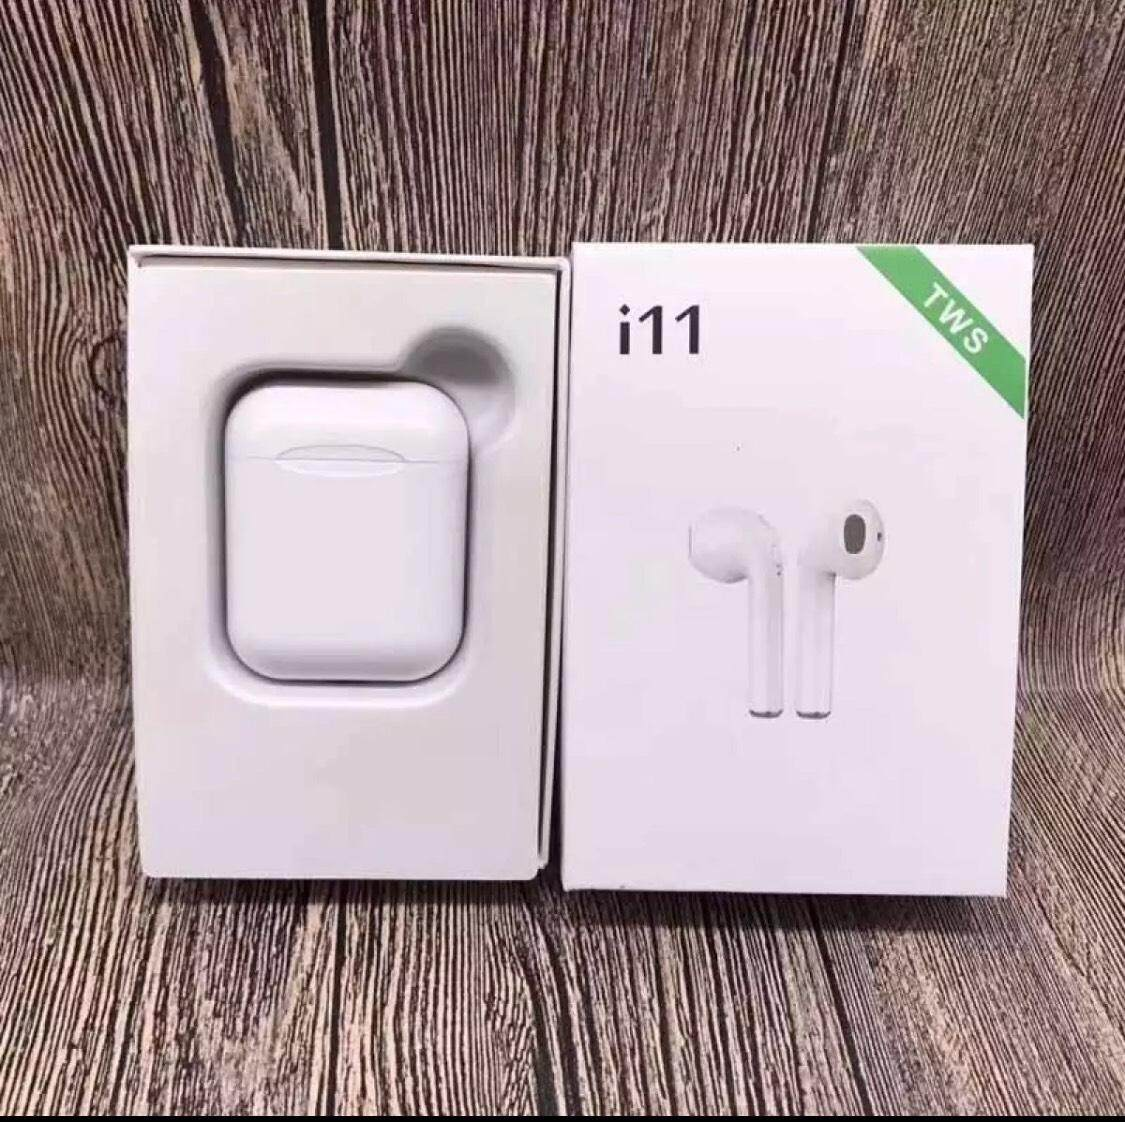 Original i11 Air pods 1:1 TWS Wireless Bluetooth 5.0 super bass stereo Earbud for iPhone meizu pop ear pods Xiaomi airdots